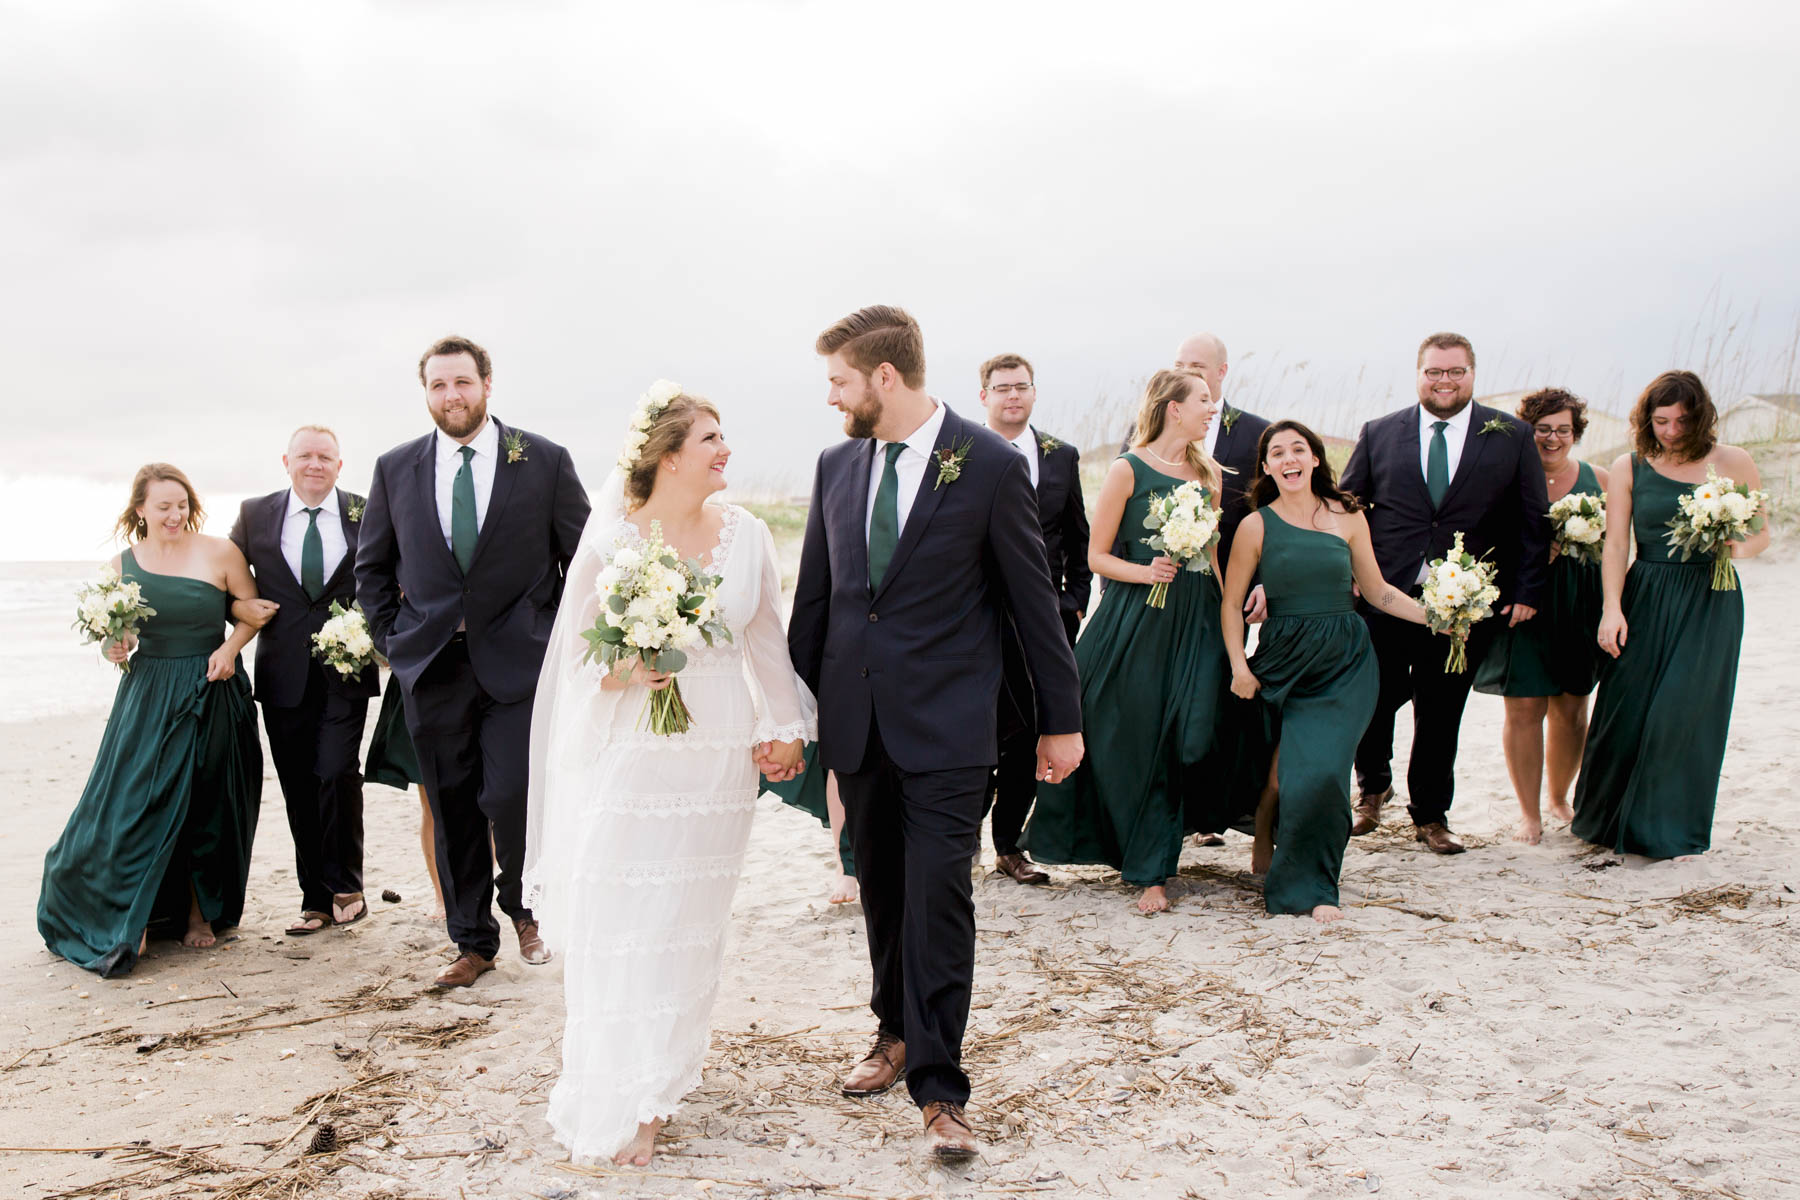 shotbychelsea_wedding_blog-37.jpg